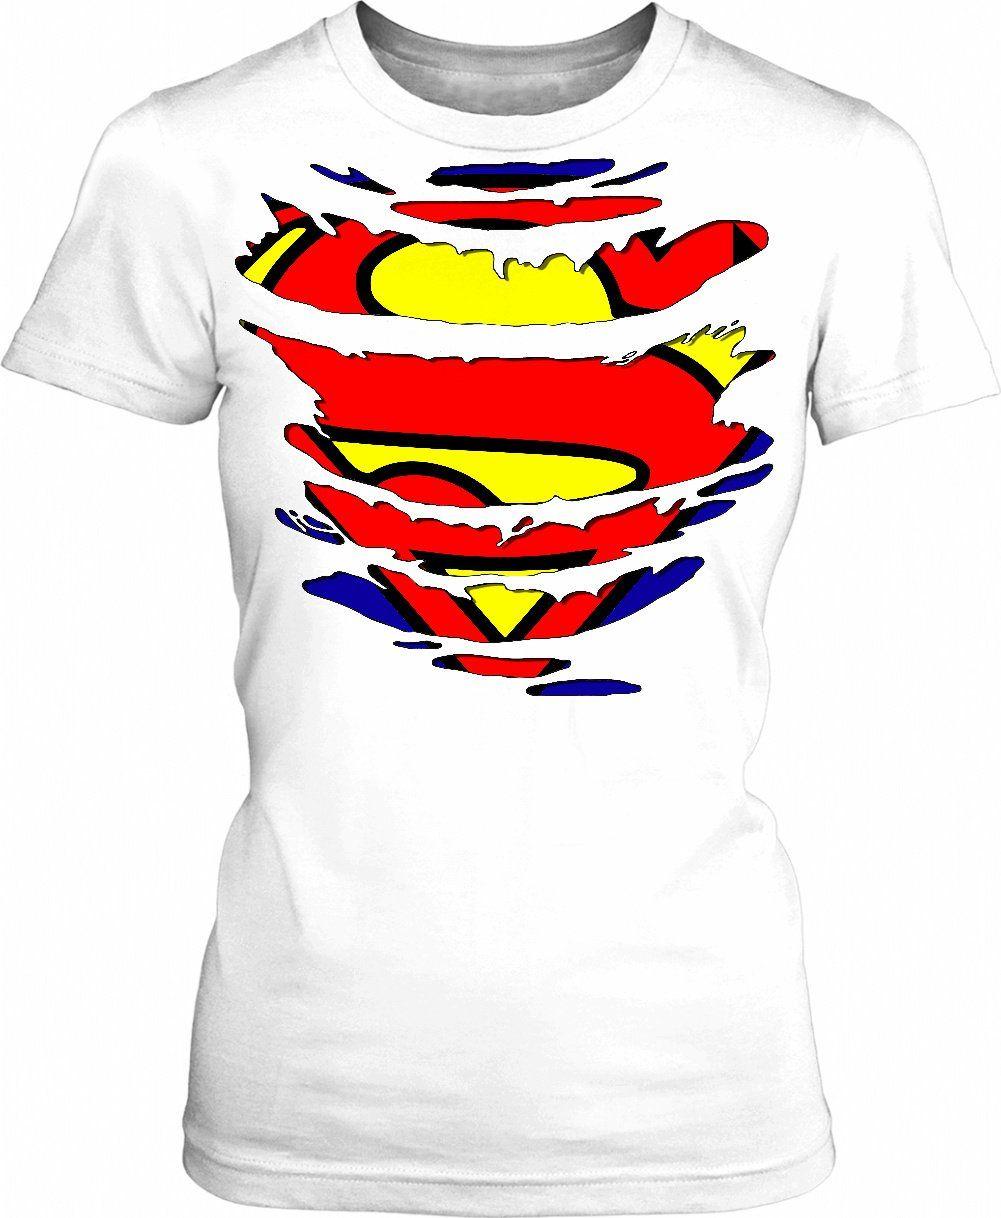 Superhero Girl In Disguise Torn Apart Tee Shirt Girls Style